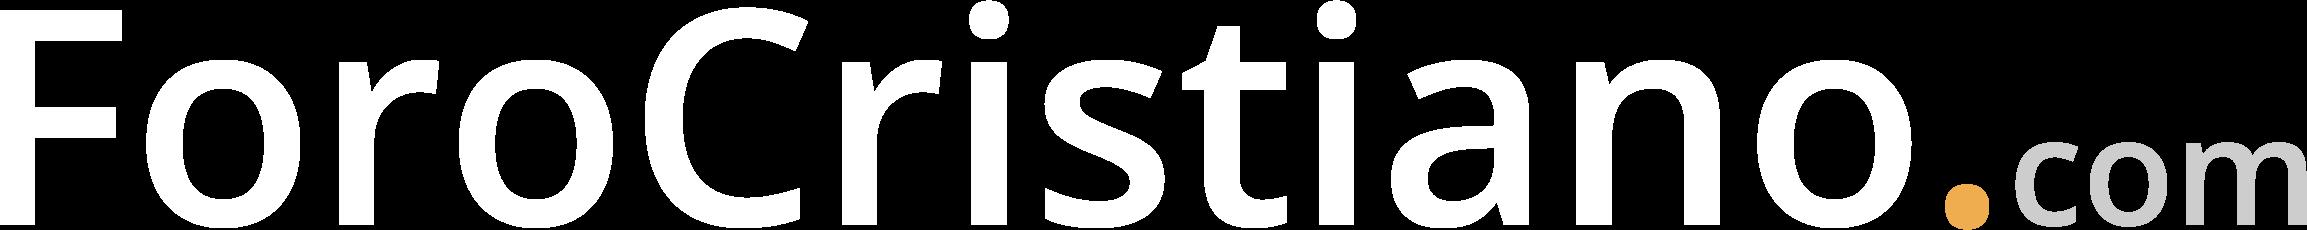 logo-forocristiano.png